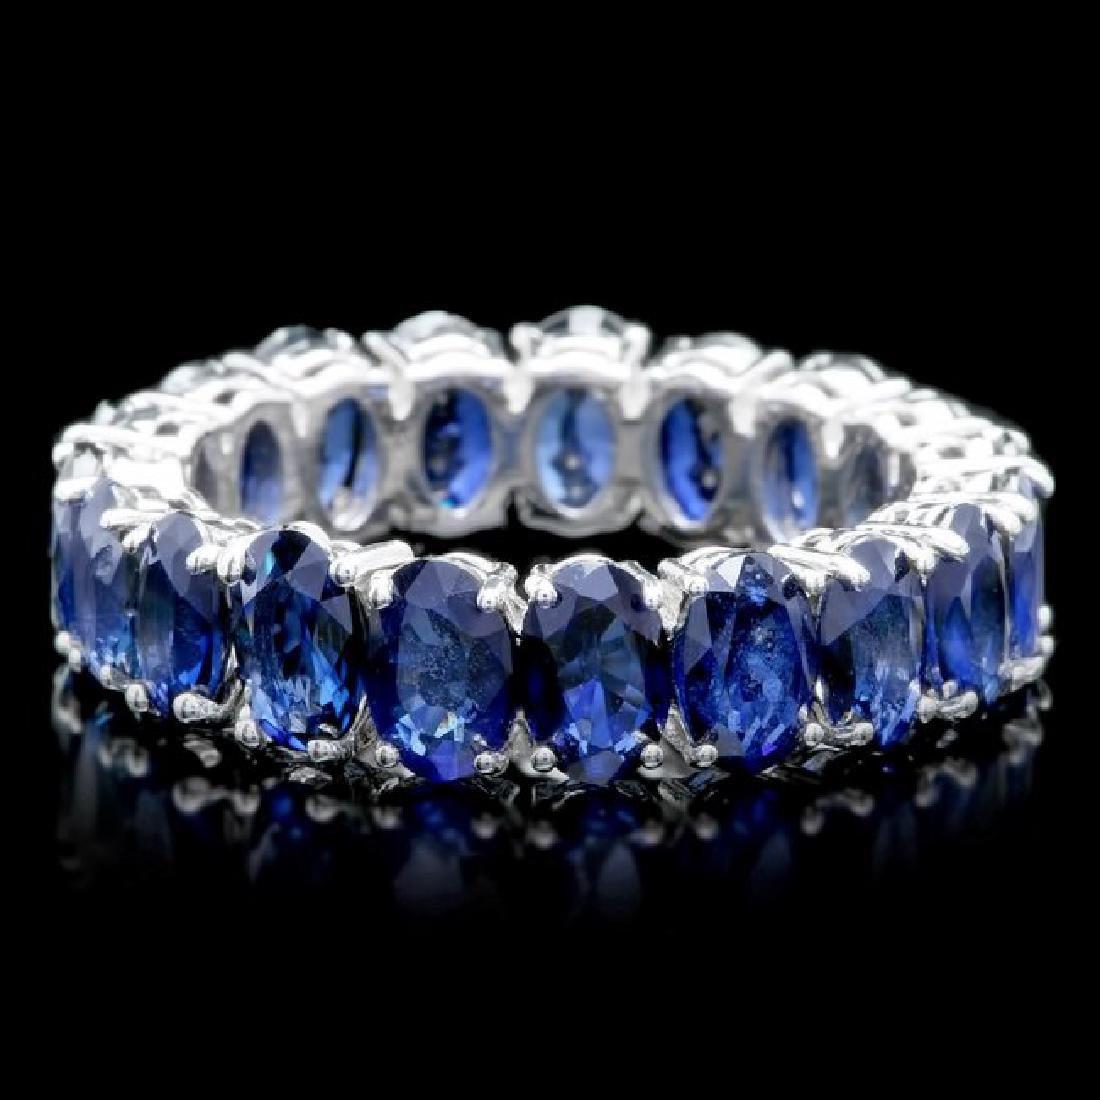 14k White Gold 9.00ct Sapphire Ring